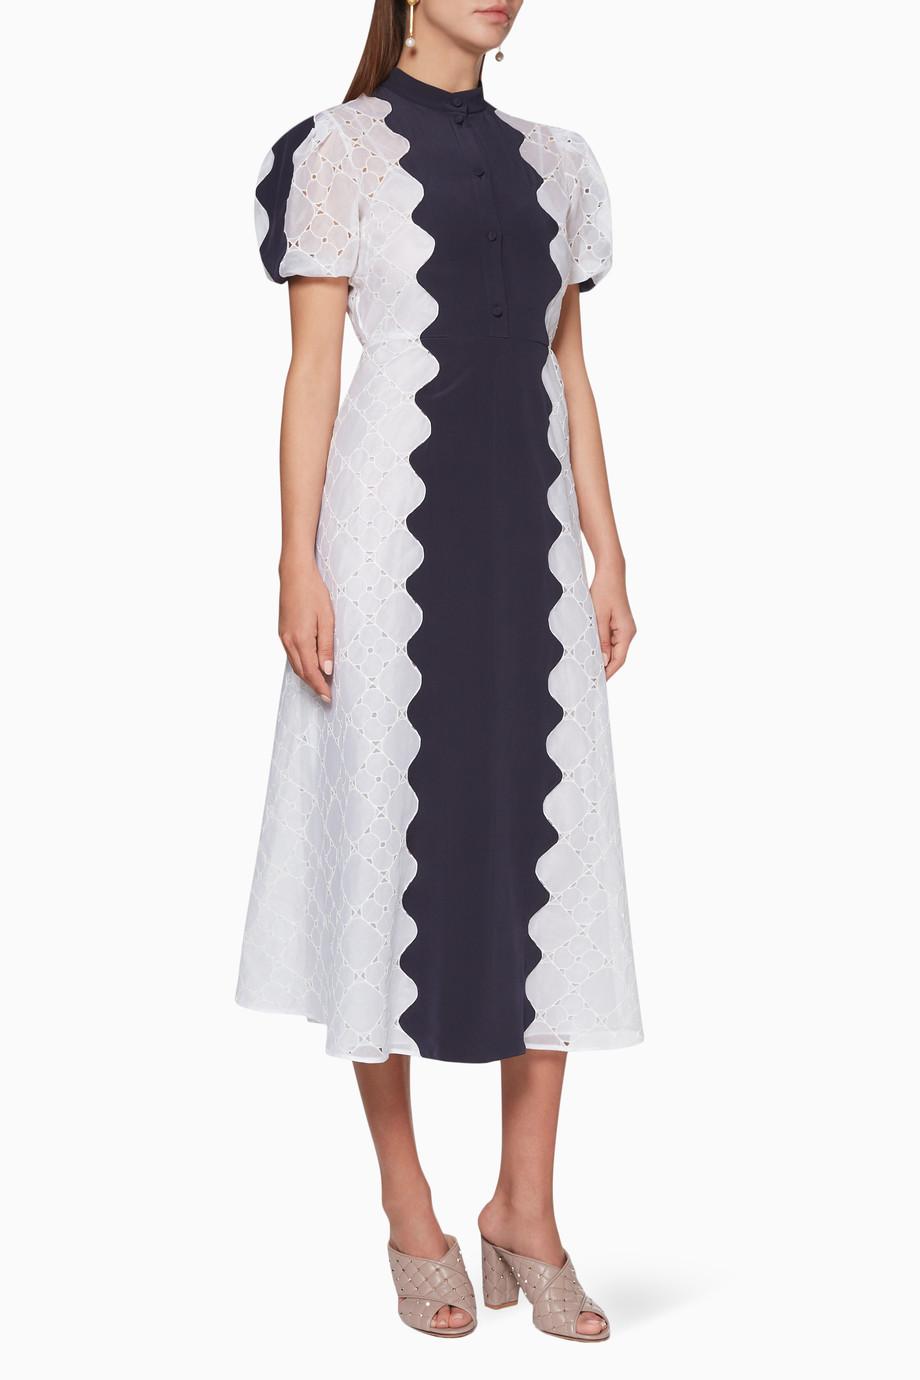 393c021ffb99a Shop Valentino White White & Navy Wave Midi Dress for Women | Ounass UAE